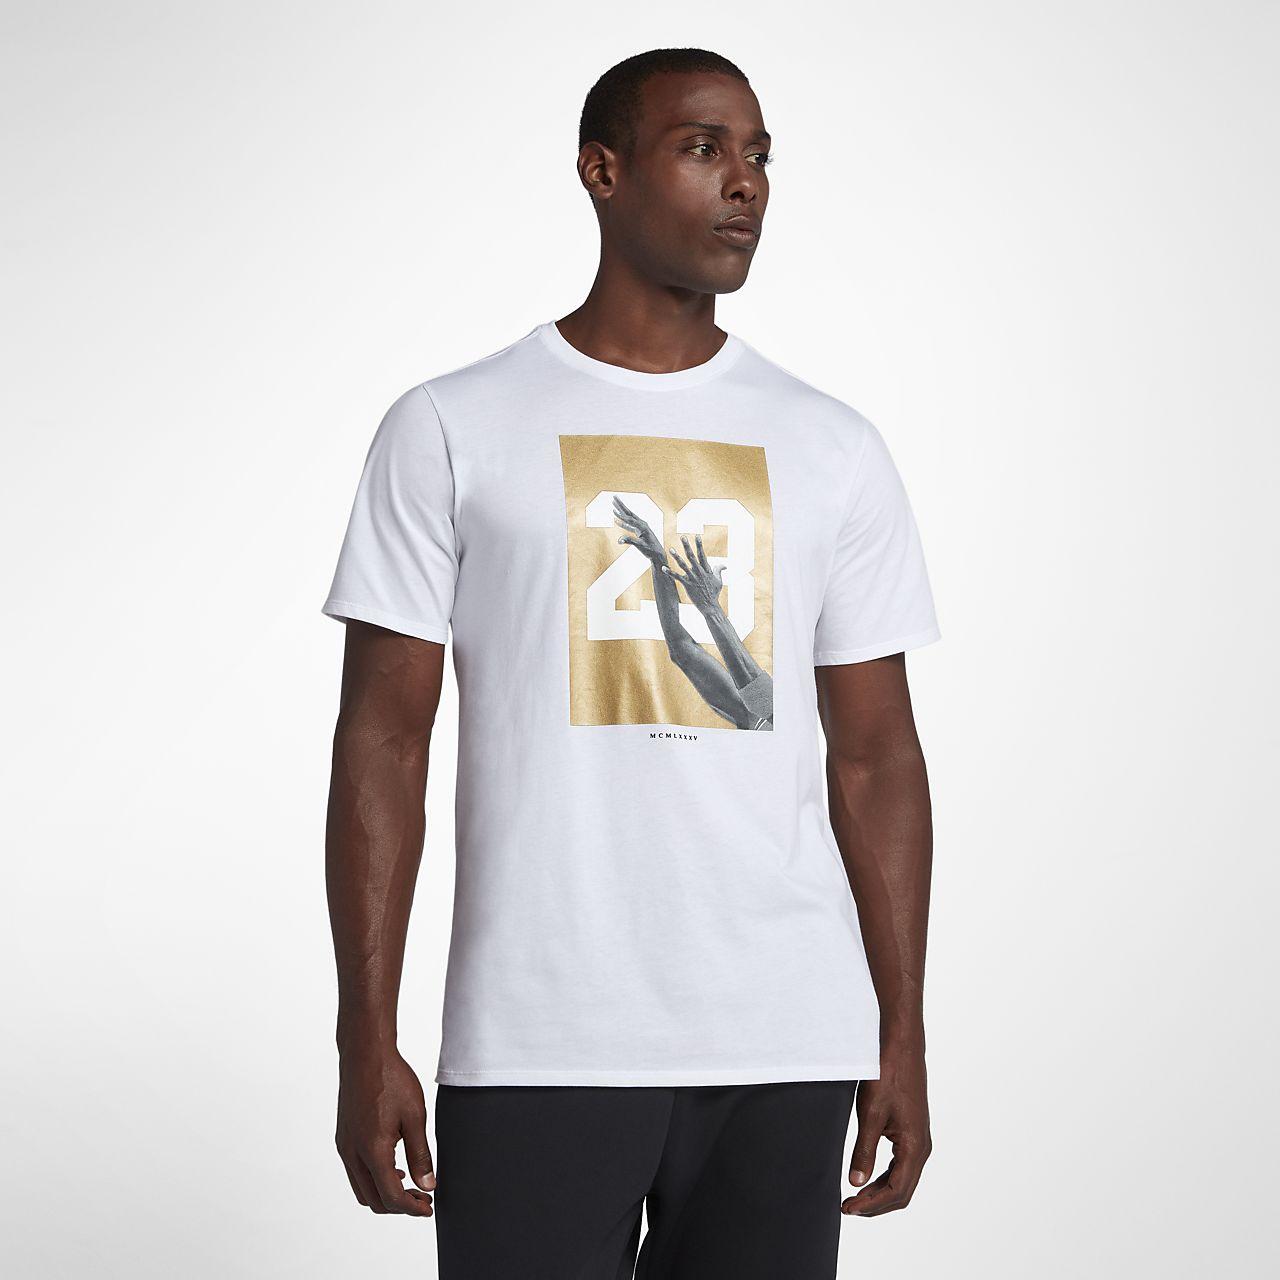 huge discount 011b5 0b36c ... Tee-shirt de basketball Jordan HO 4 pour Homme. Blanc